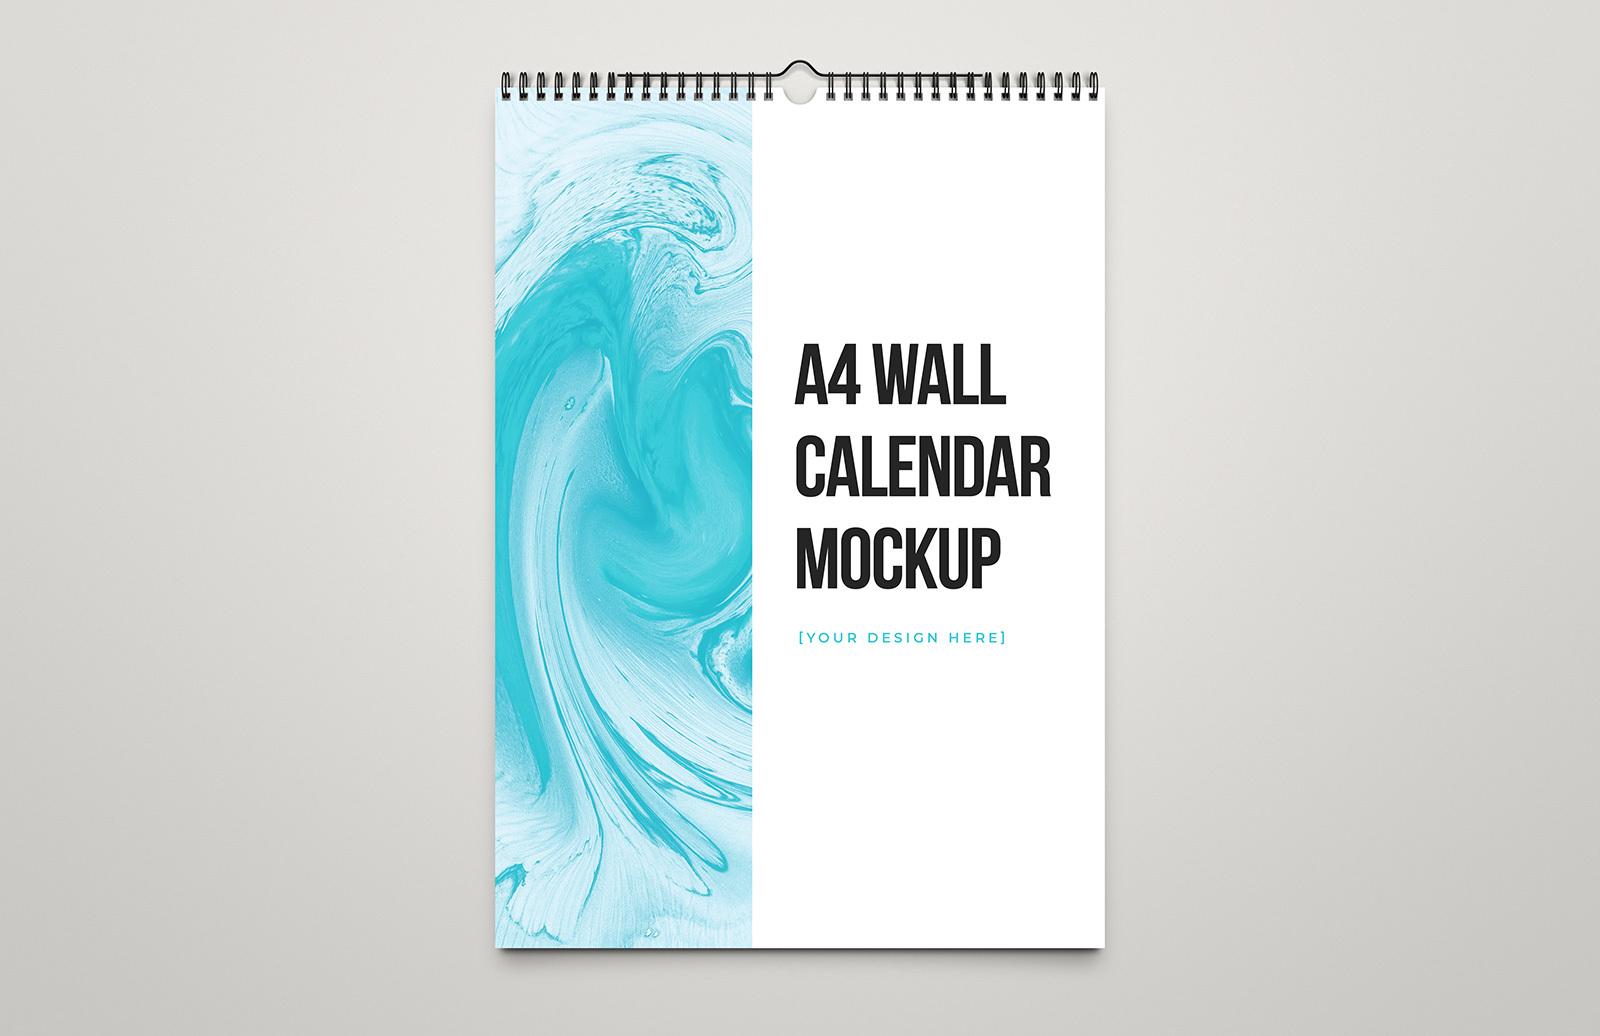 A4 Wall Calendar Mockup Preview 1